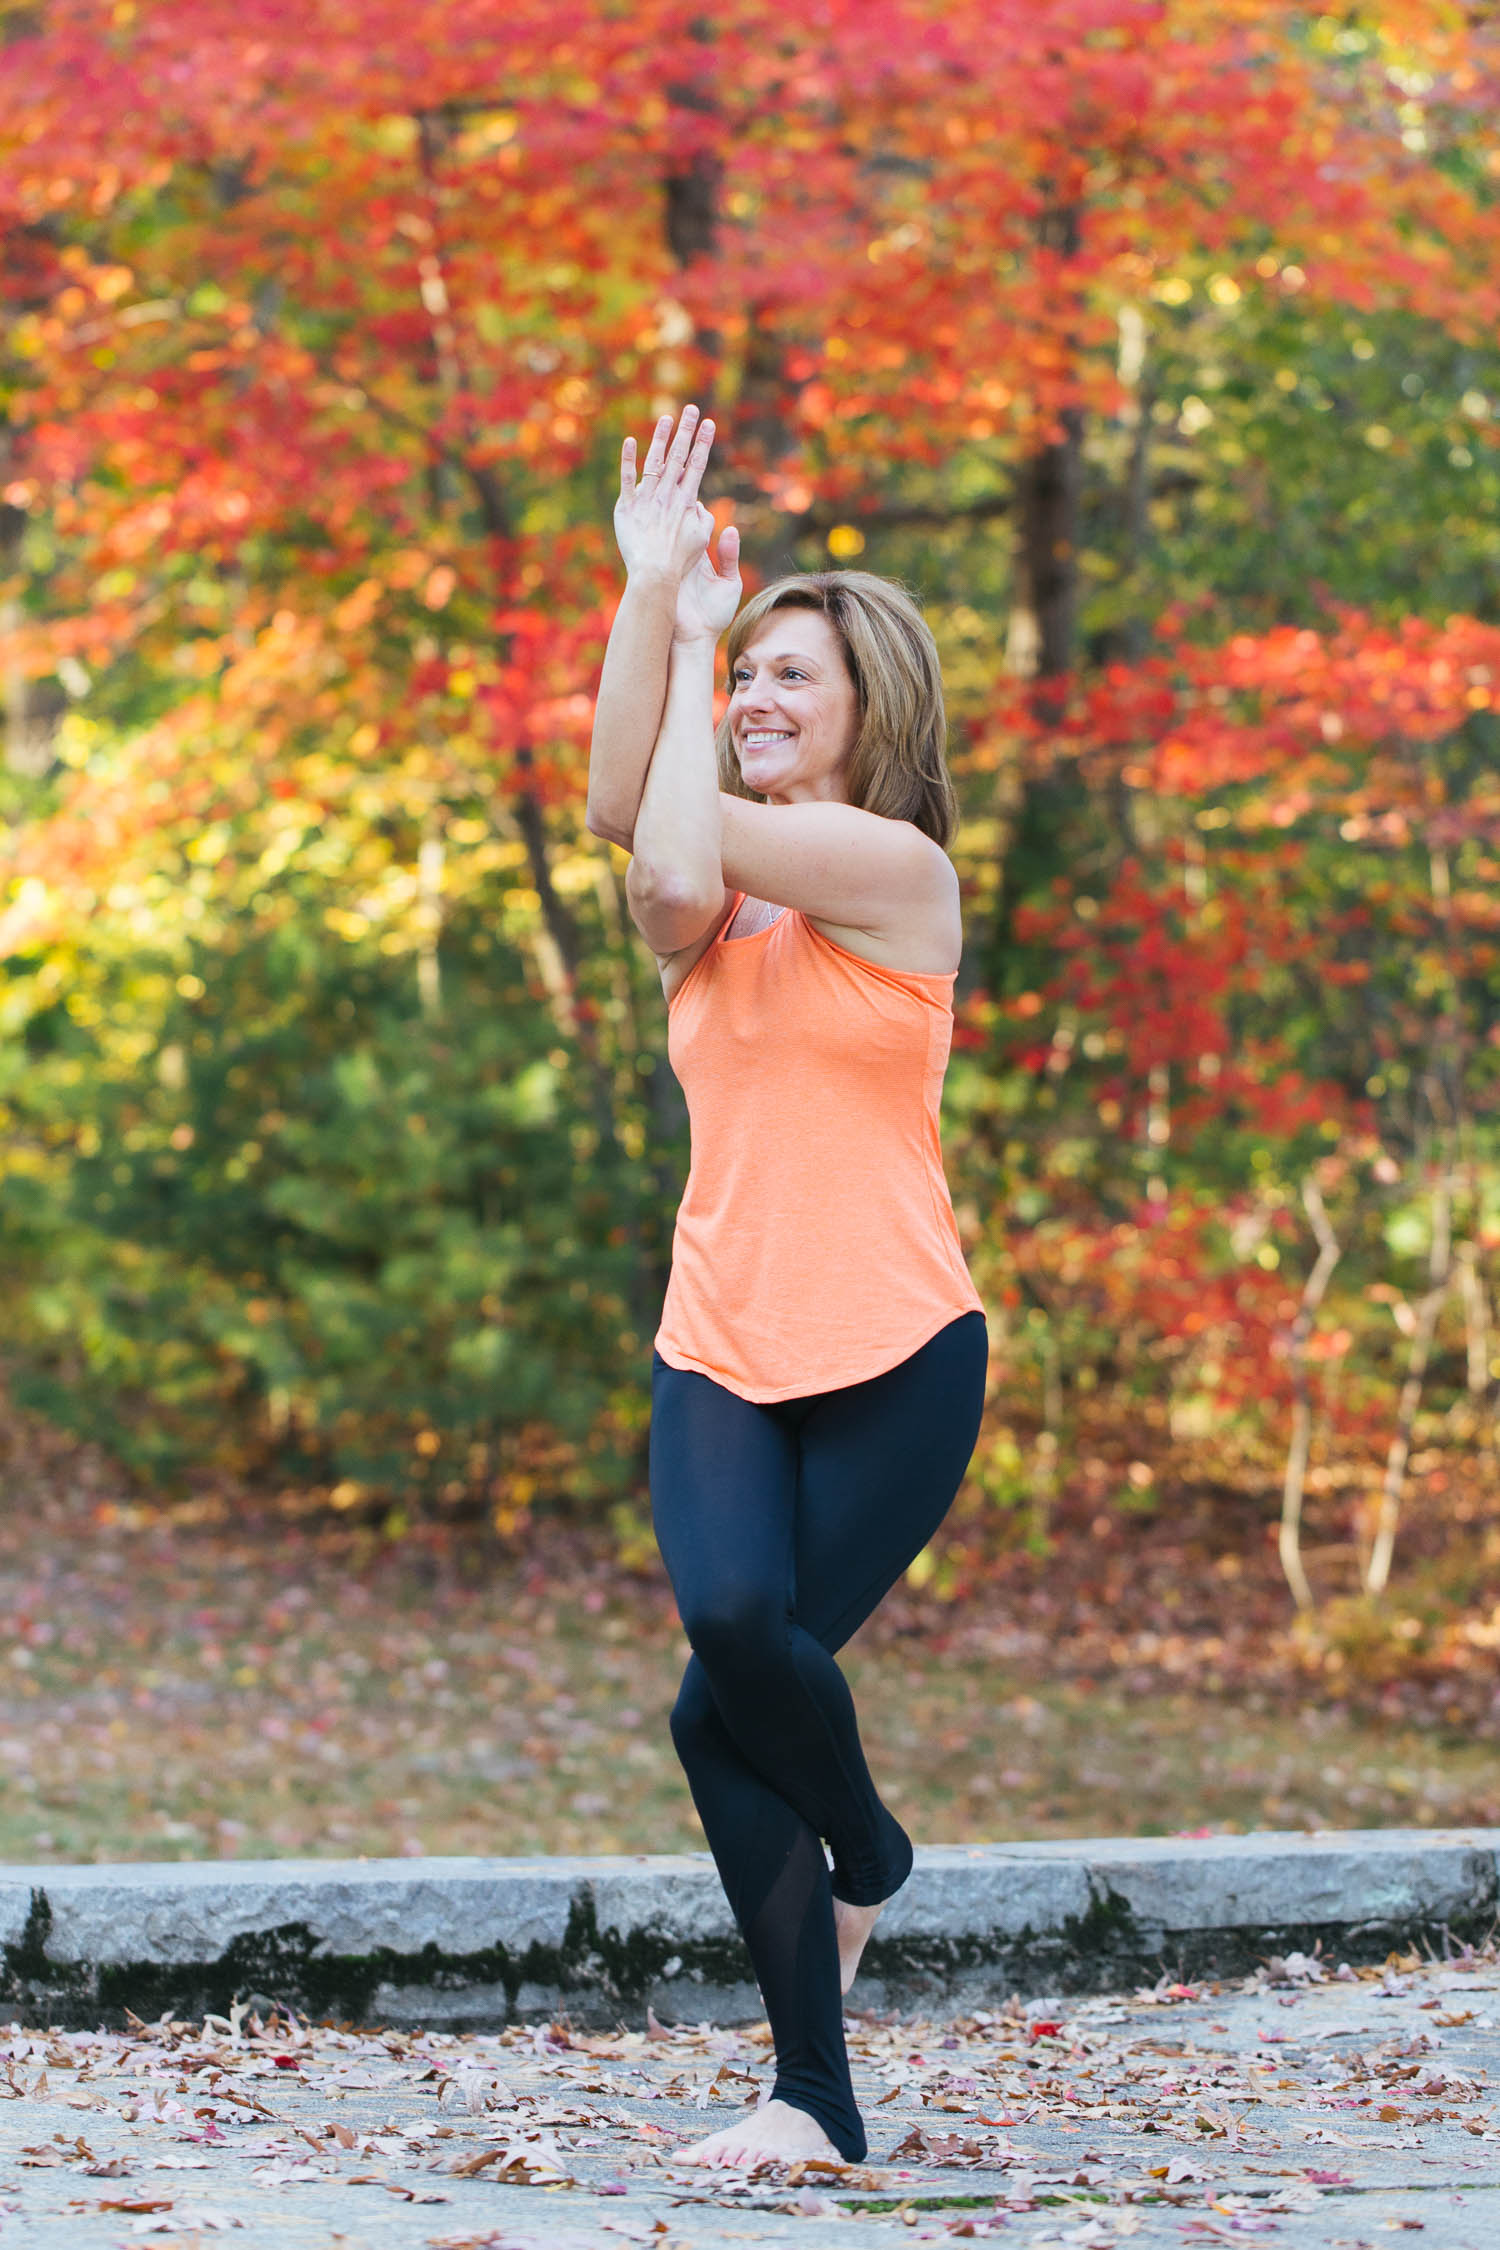 universal-power-yoga-teacher-training-norwood-ma-yoga-photographer-5687.jpg